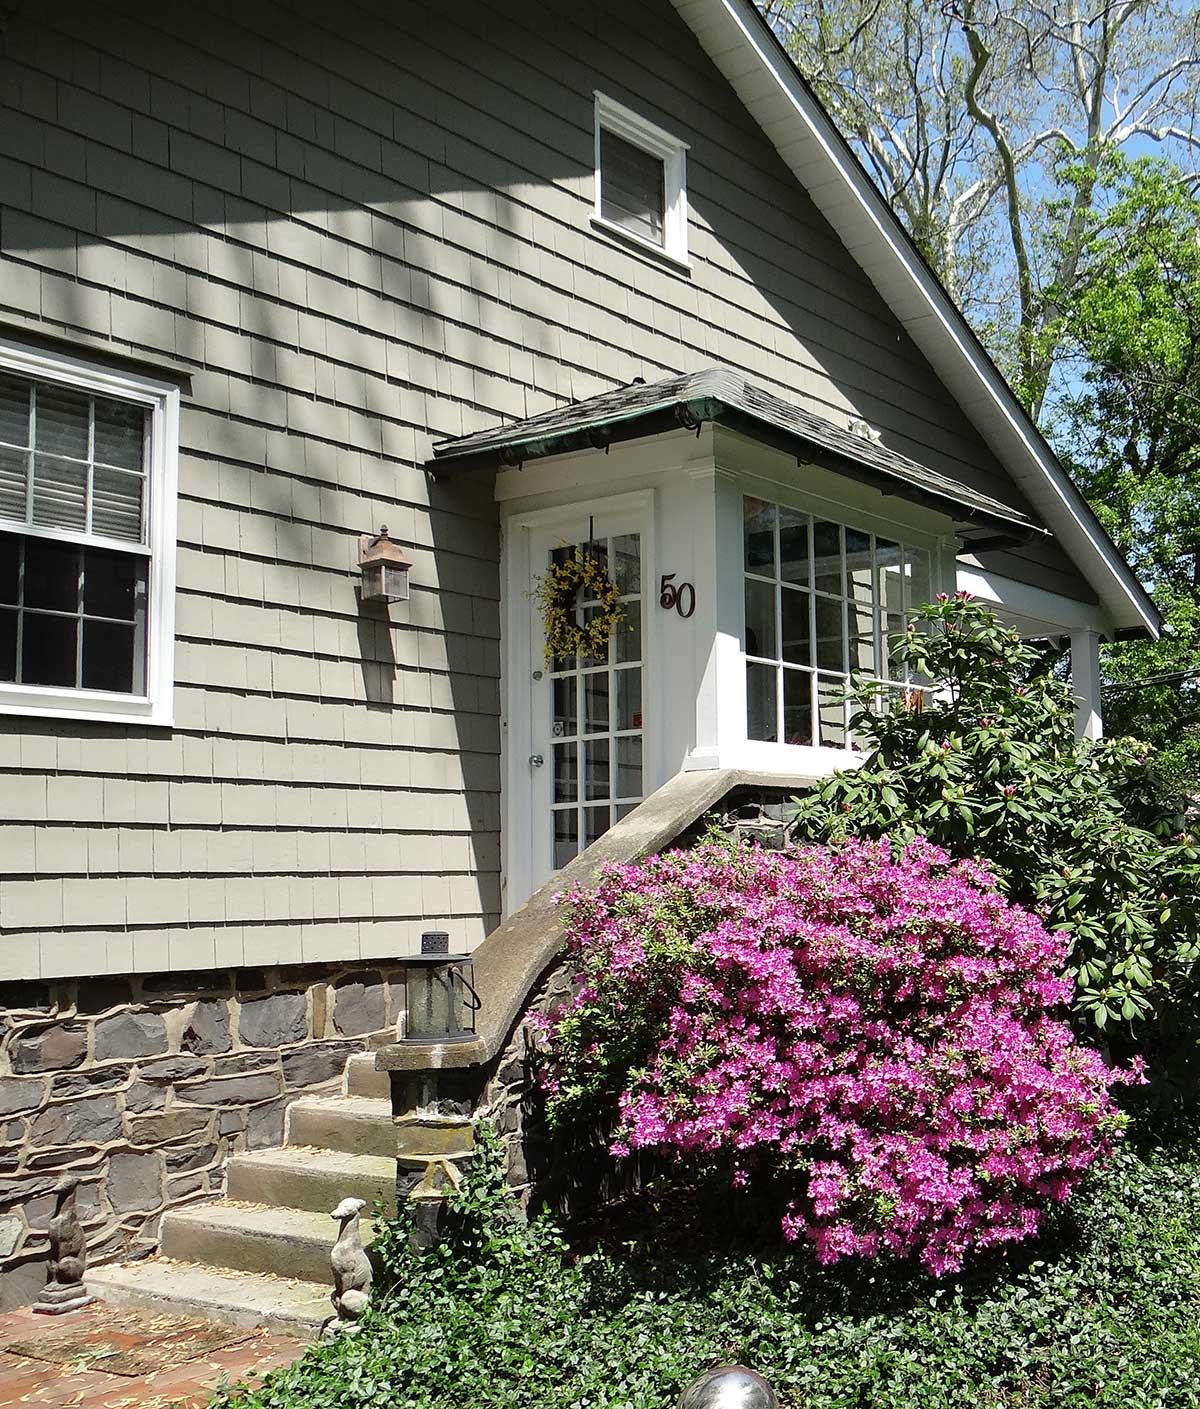 Trim work around the exterior doors and windows